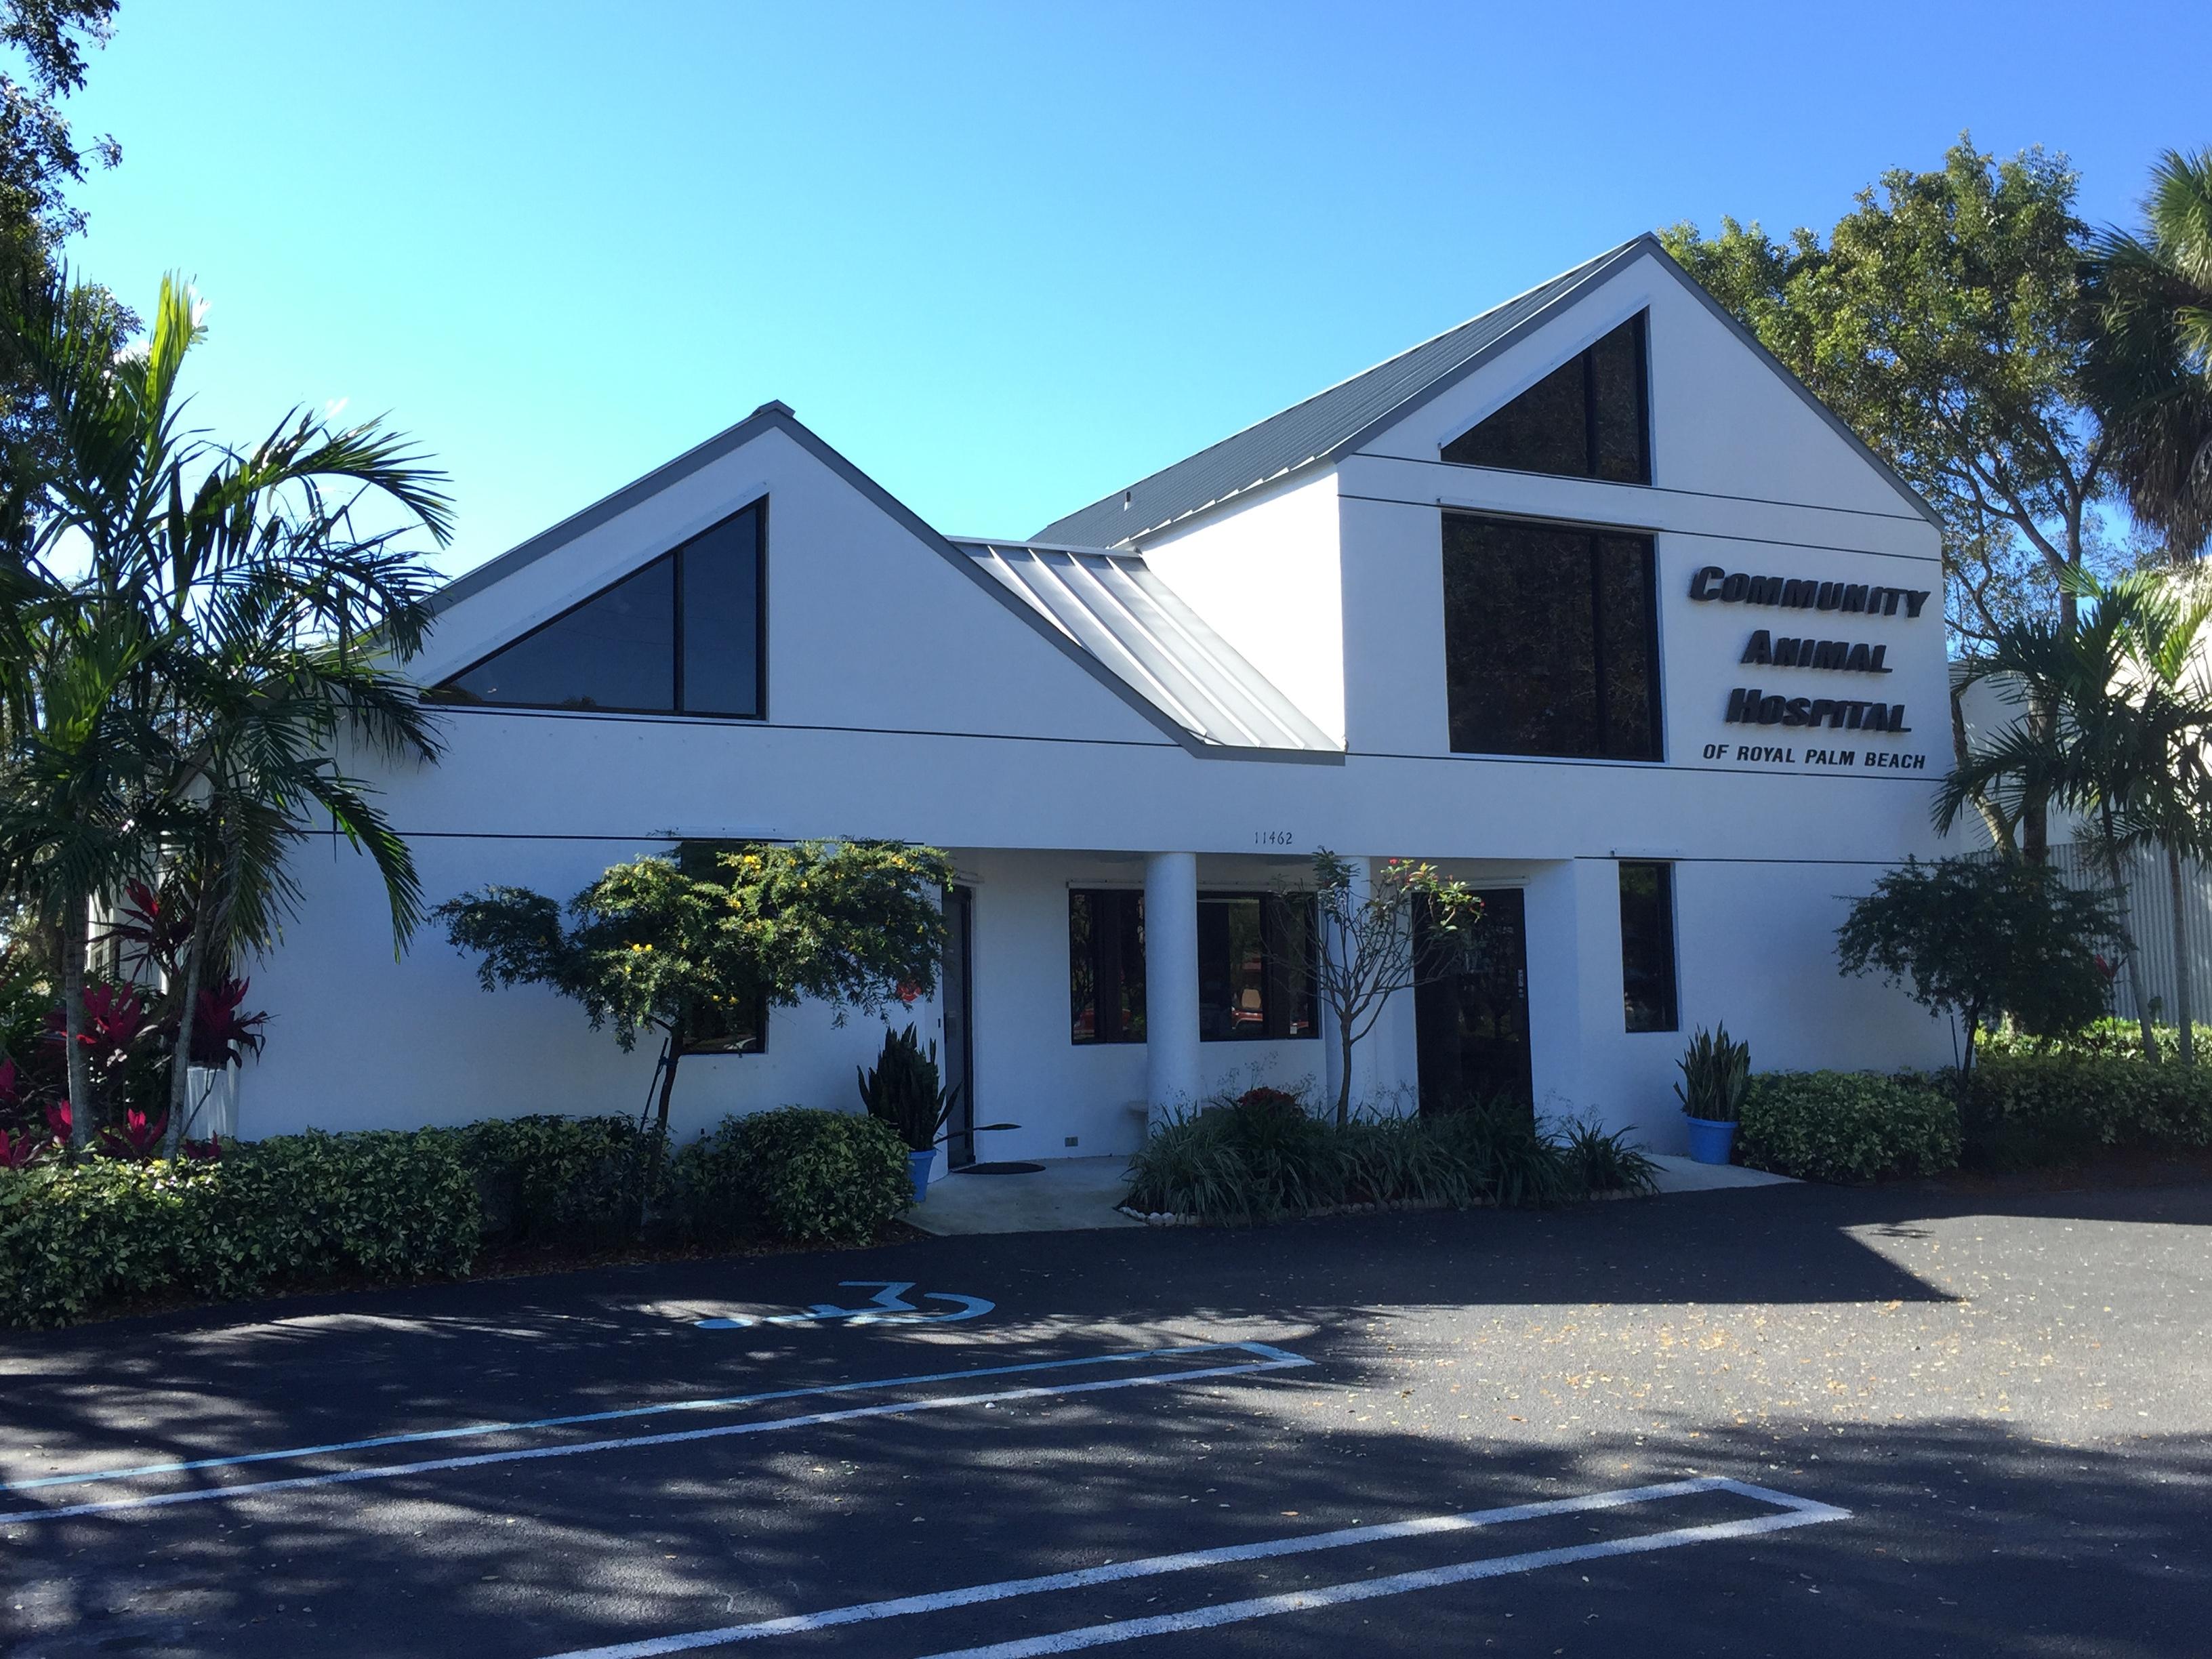 Community Animal Hospital of Royal Palm Beach image 0